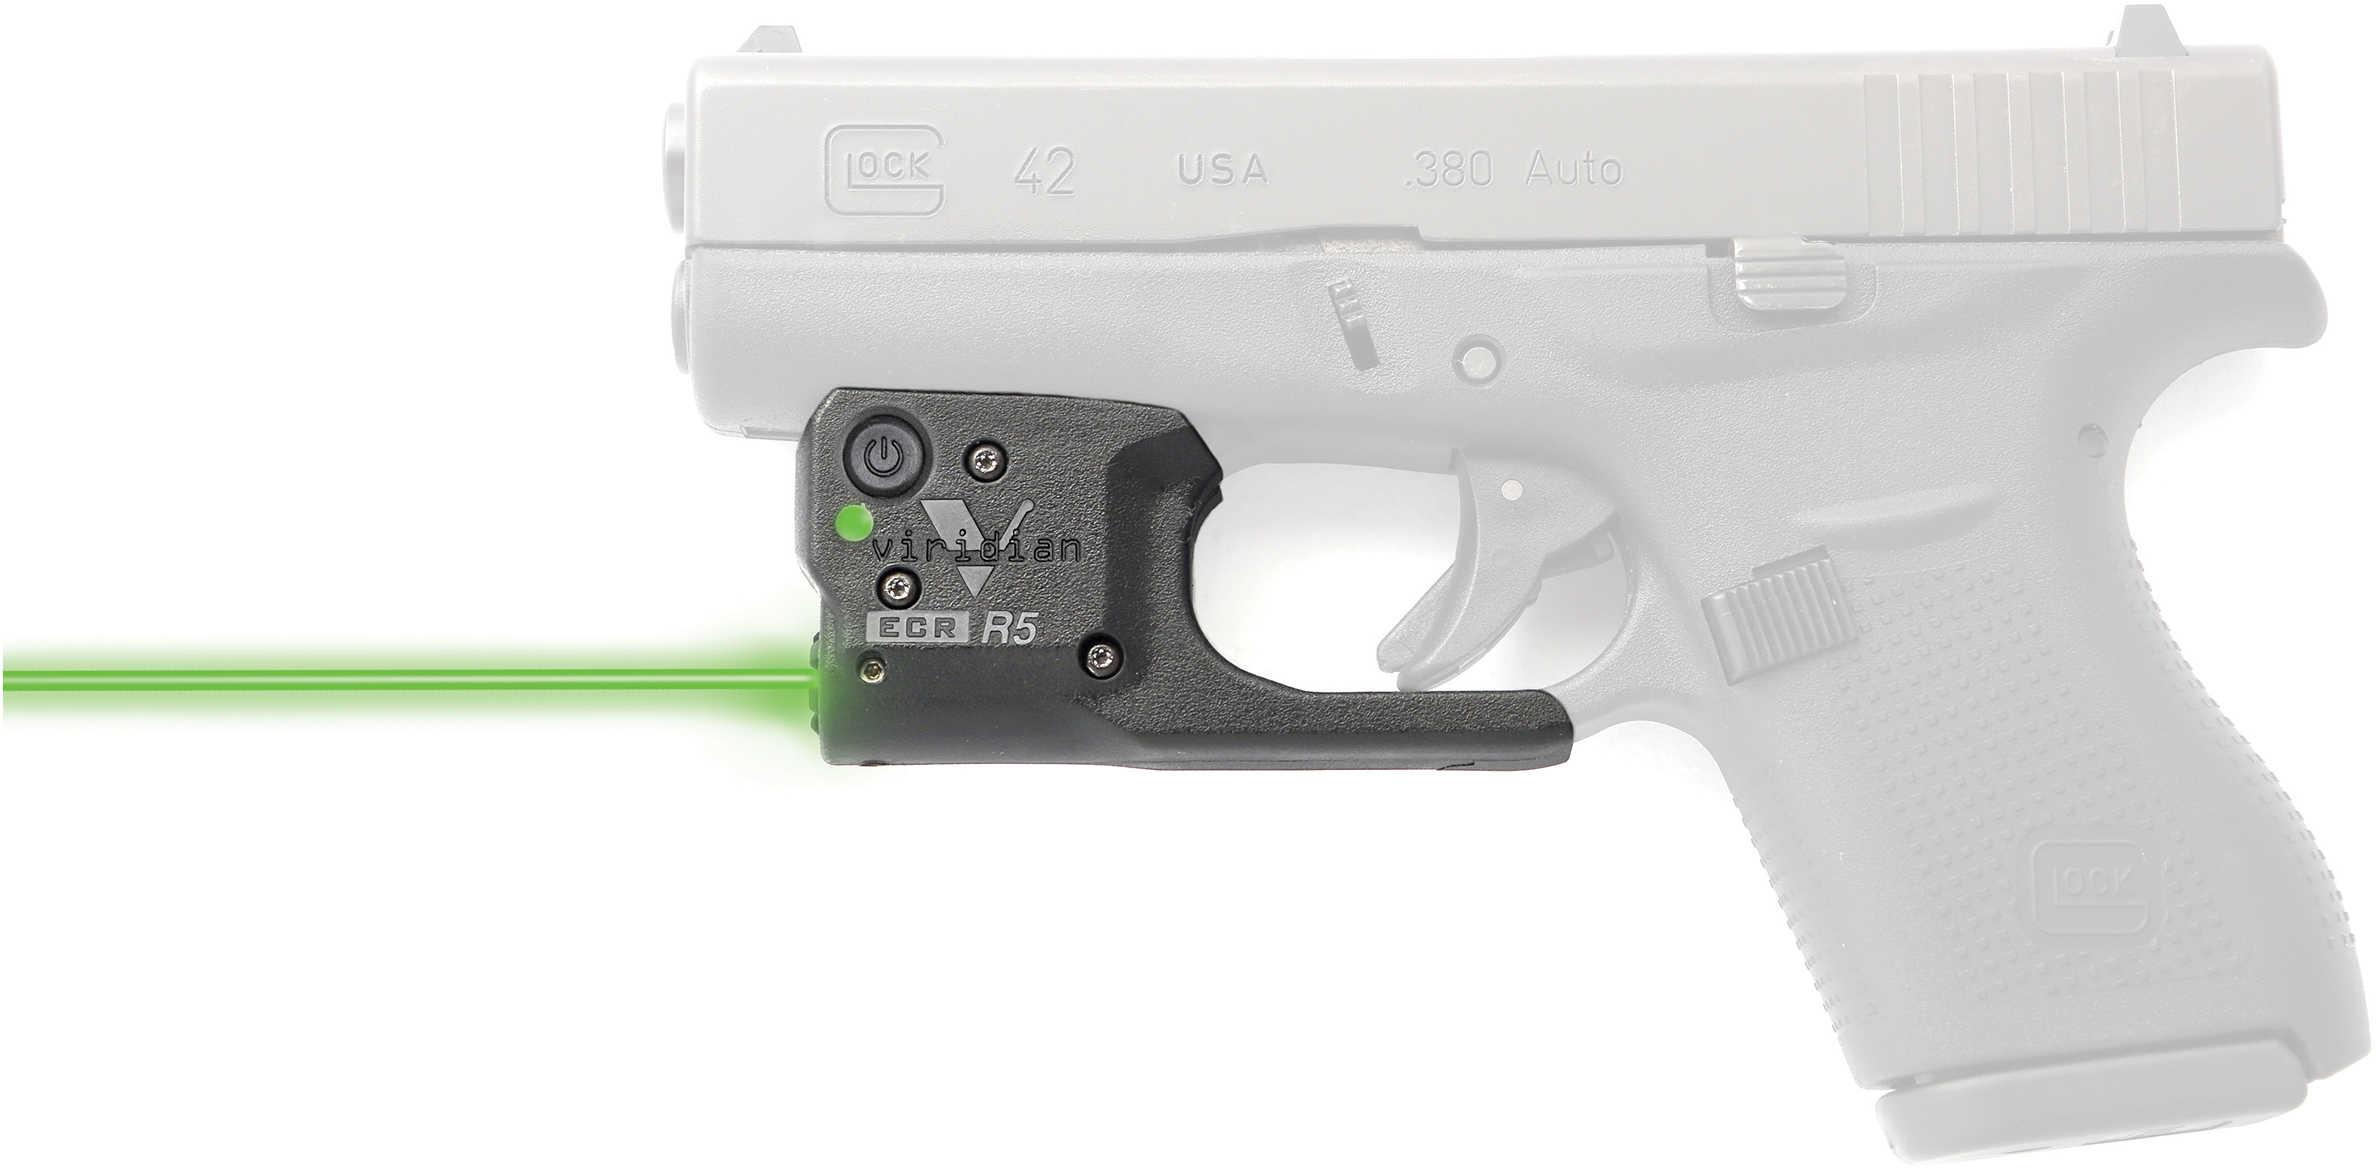 Reactor 5 Gen II Green Laser Glock 42 with ECR Instant On IWB Holster, Black